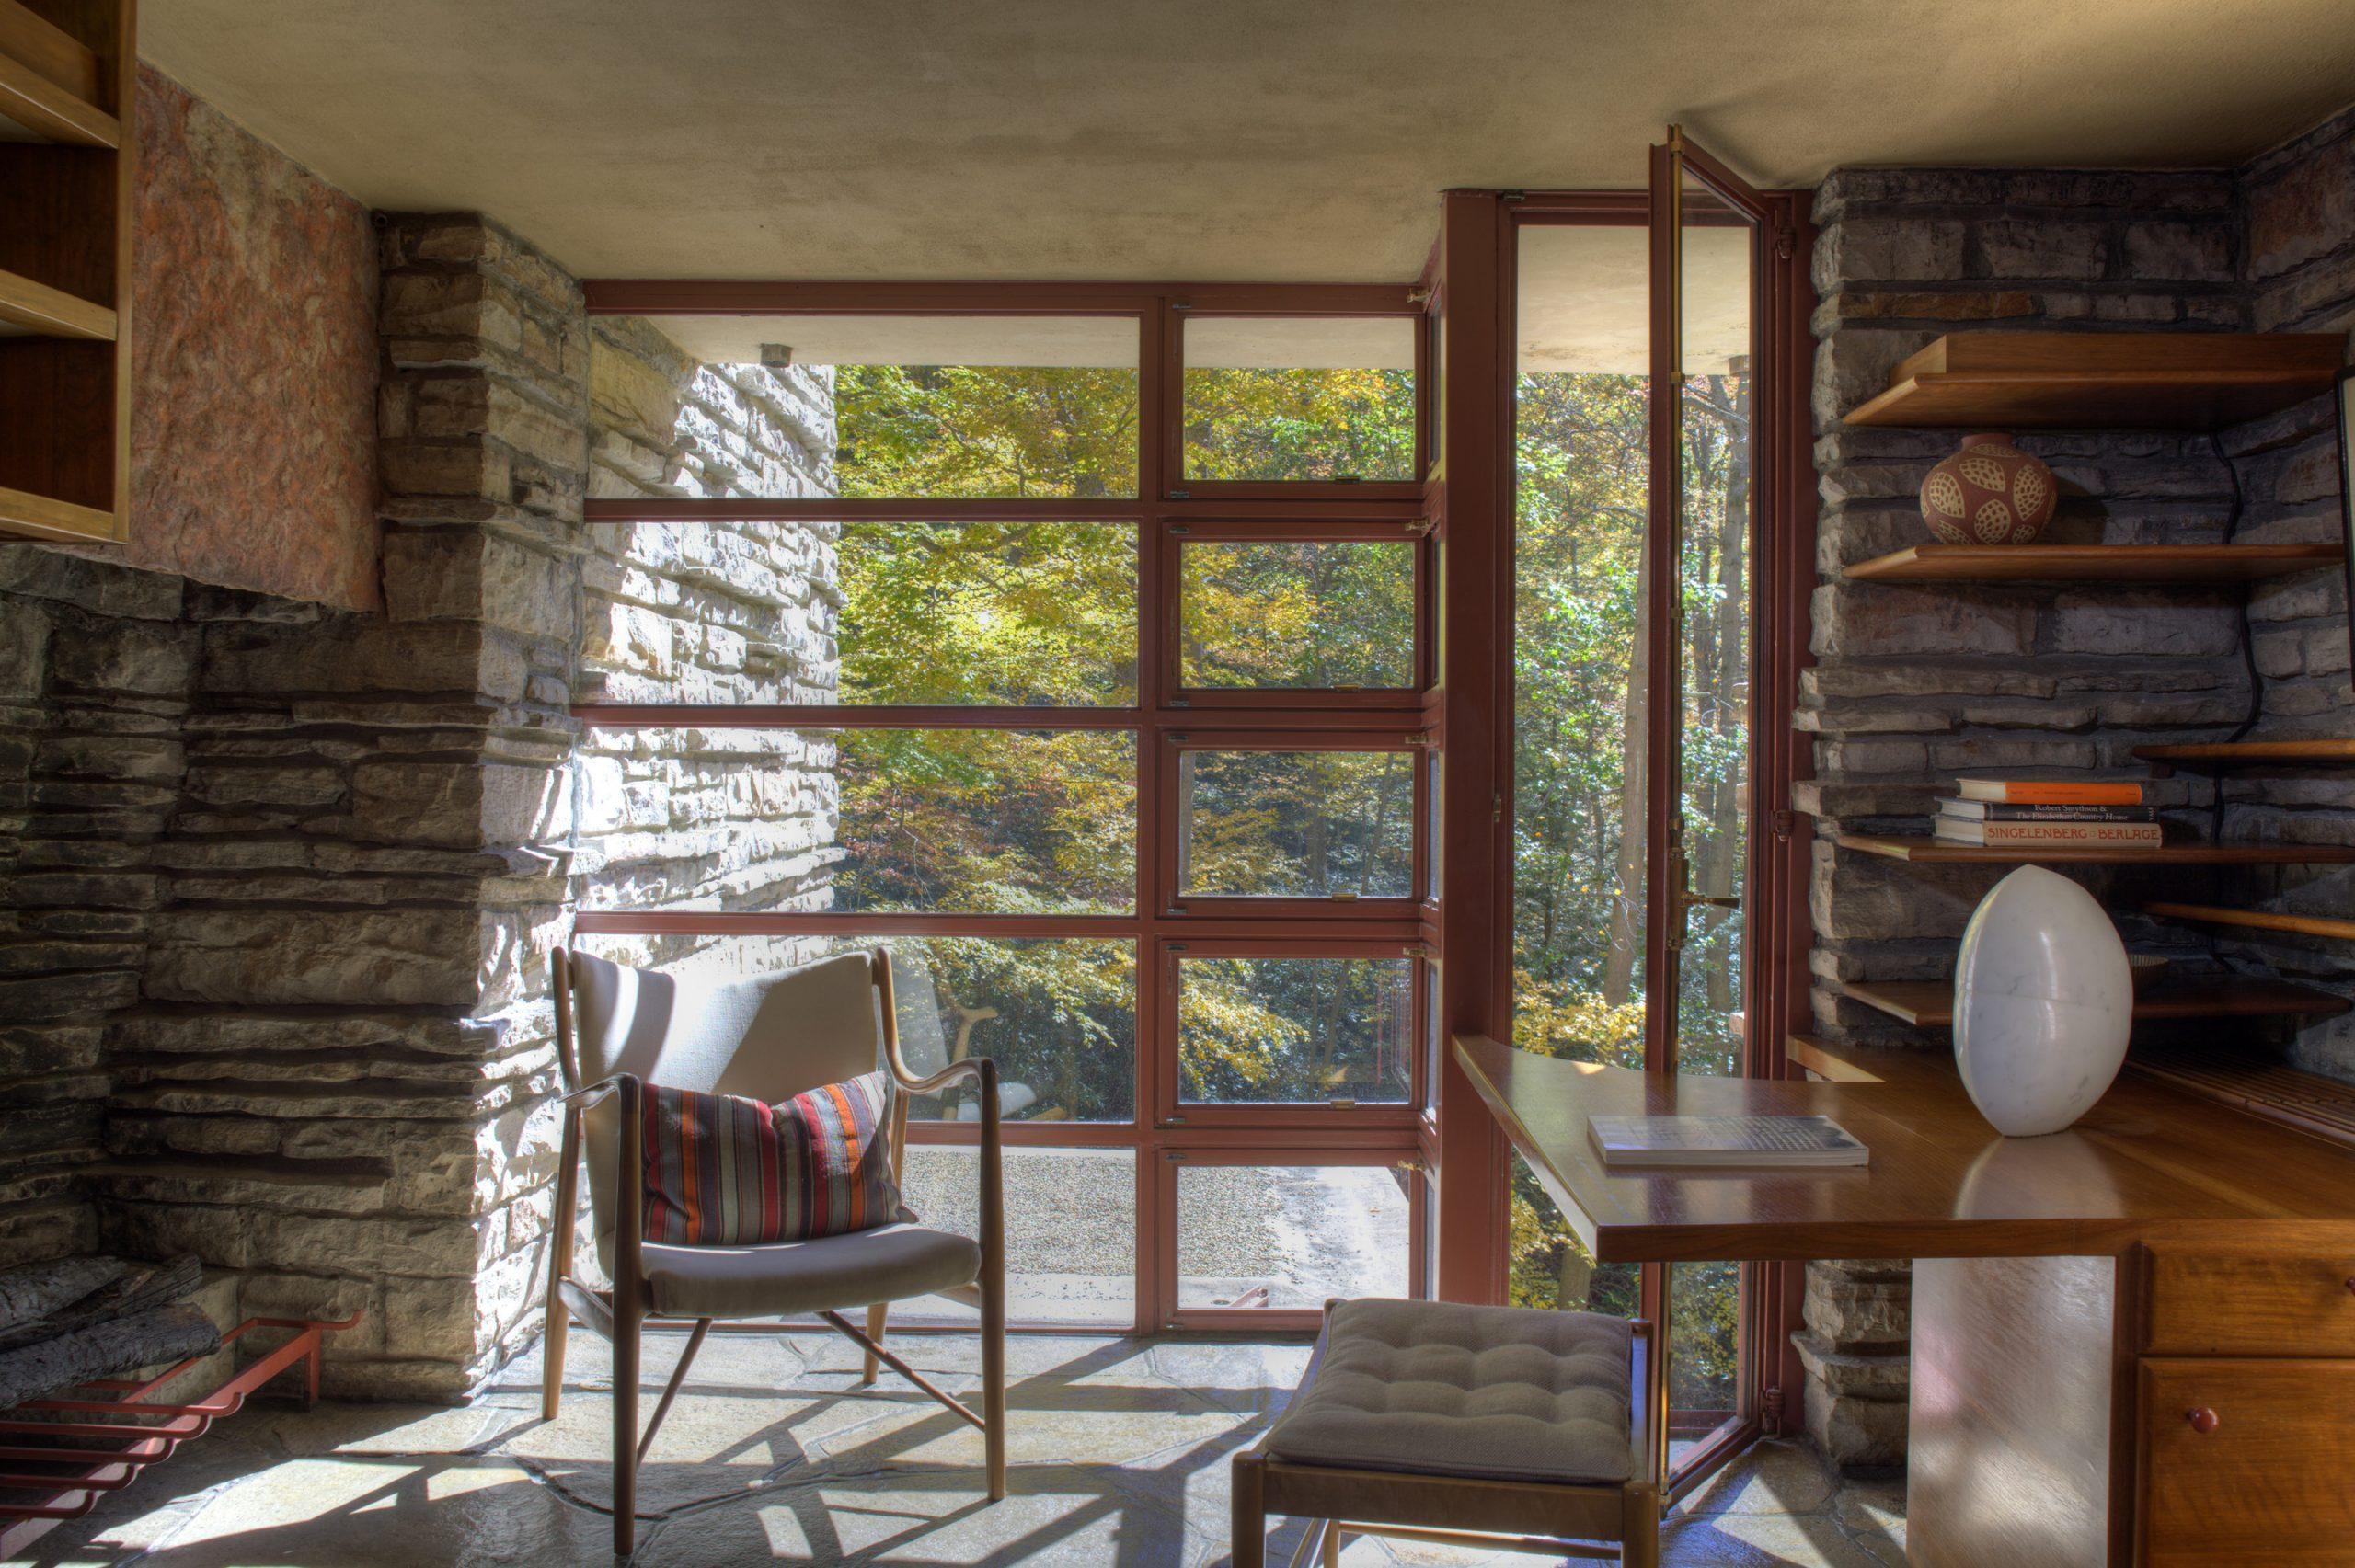 Fallingwater-view-of-Edgar-Kaufmann-jr-study_courtesy-of-the-Western-Pennsylvania-Conservancy-scaled